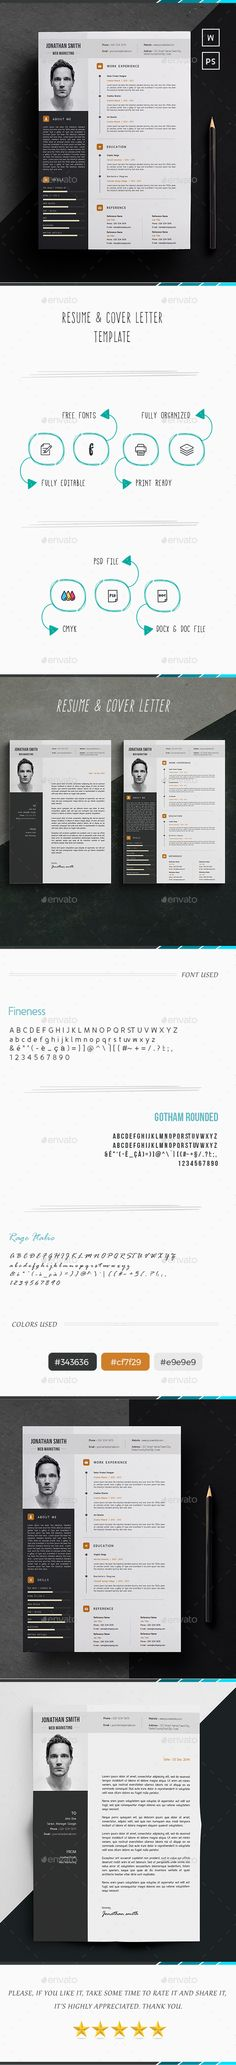 Infographic Resume Cv Volume 7 Infographic resume, Resume cv and - web resume templates